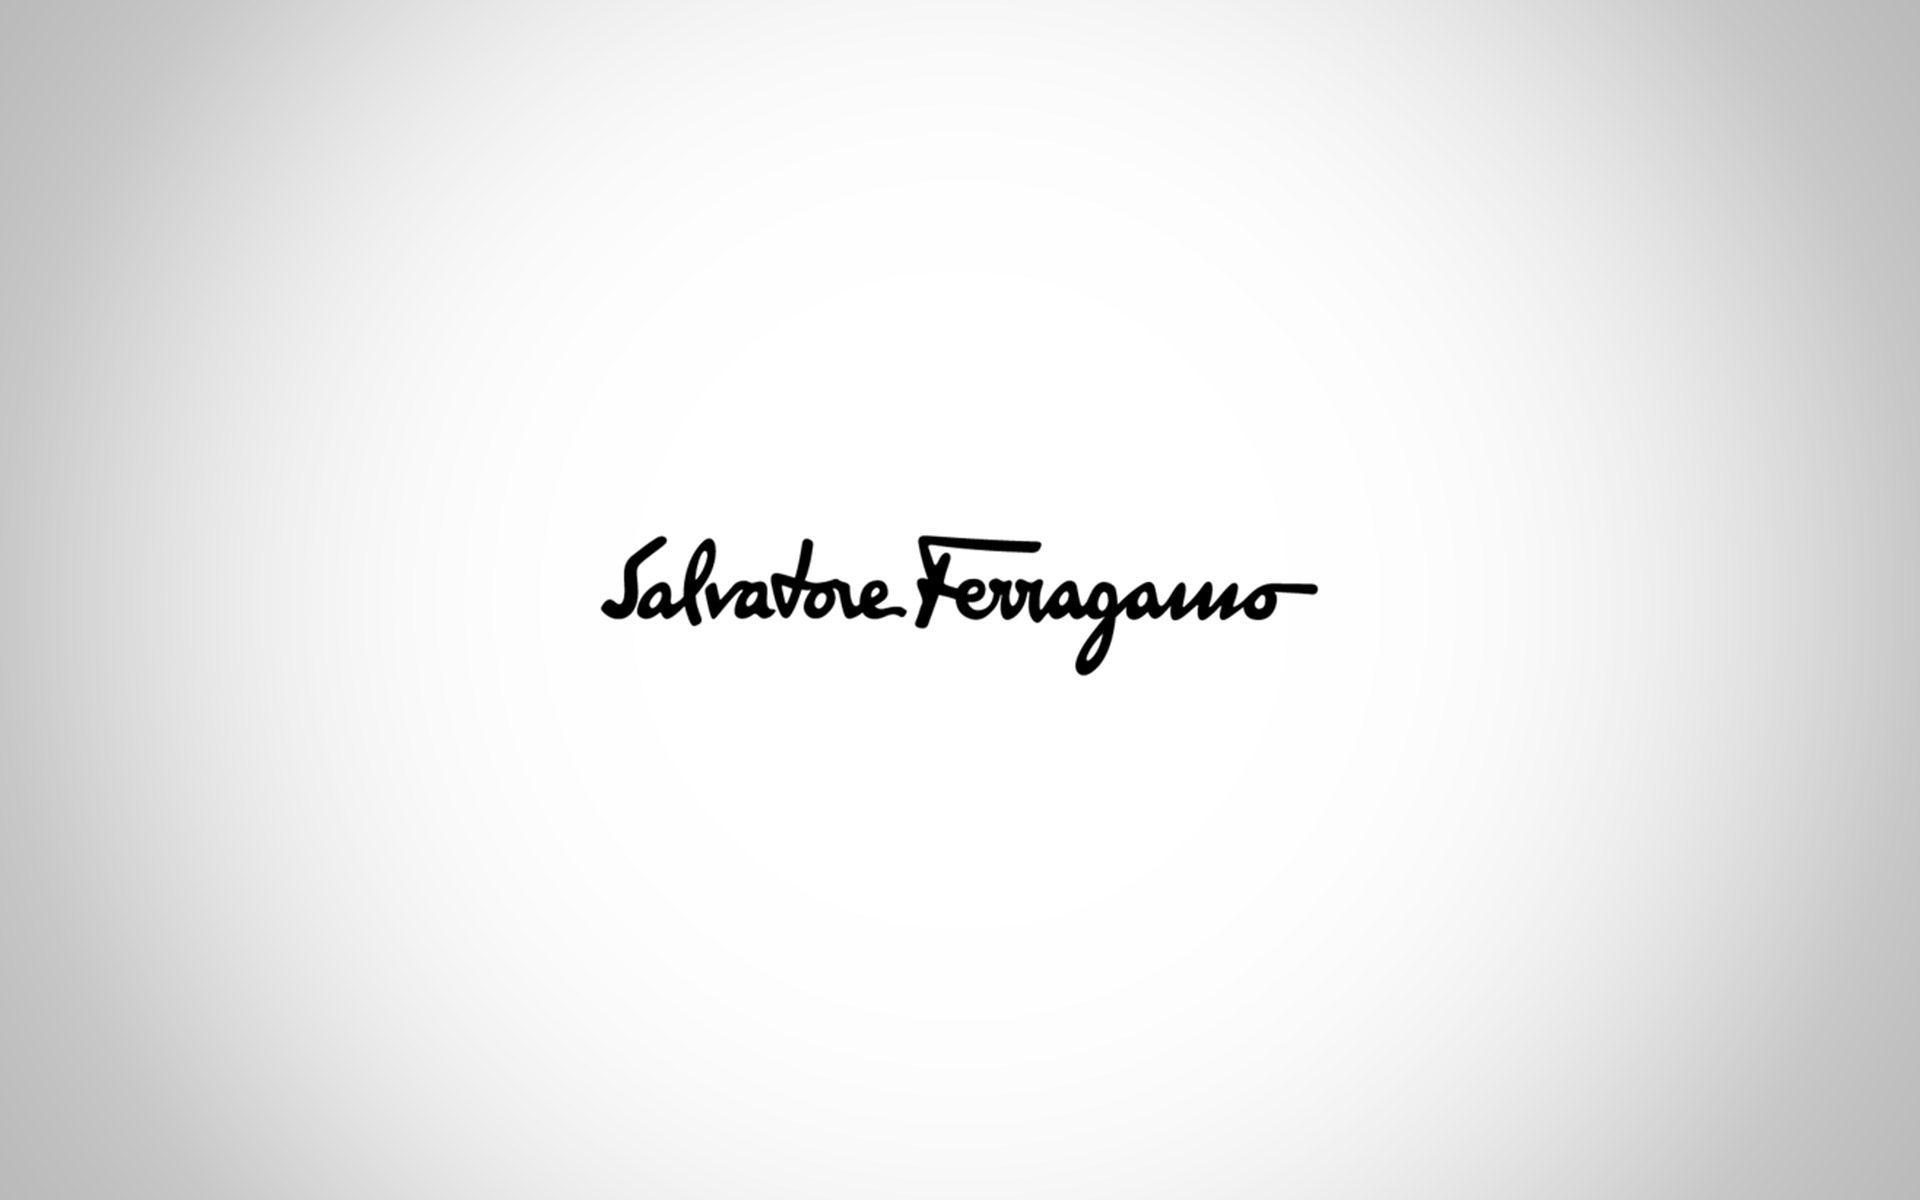 Ferragamo Logo Wallpapers   Top Ferragamo Logo Backgrounds 1920x1200